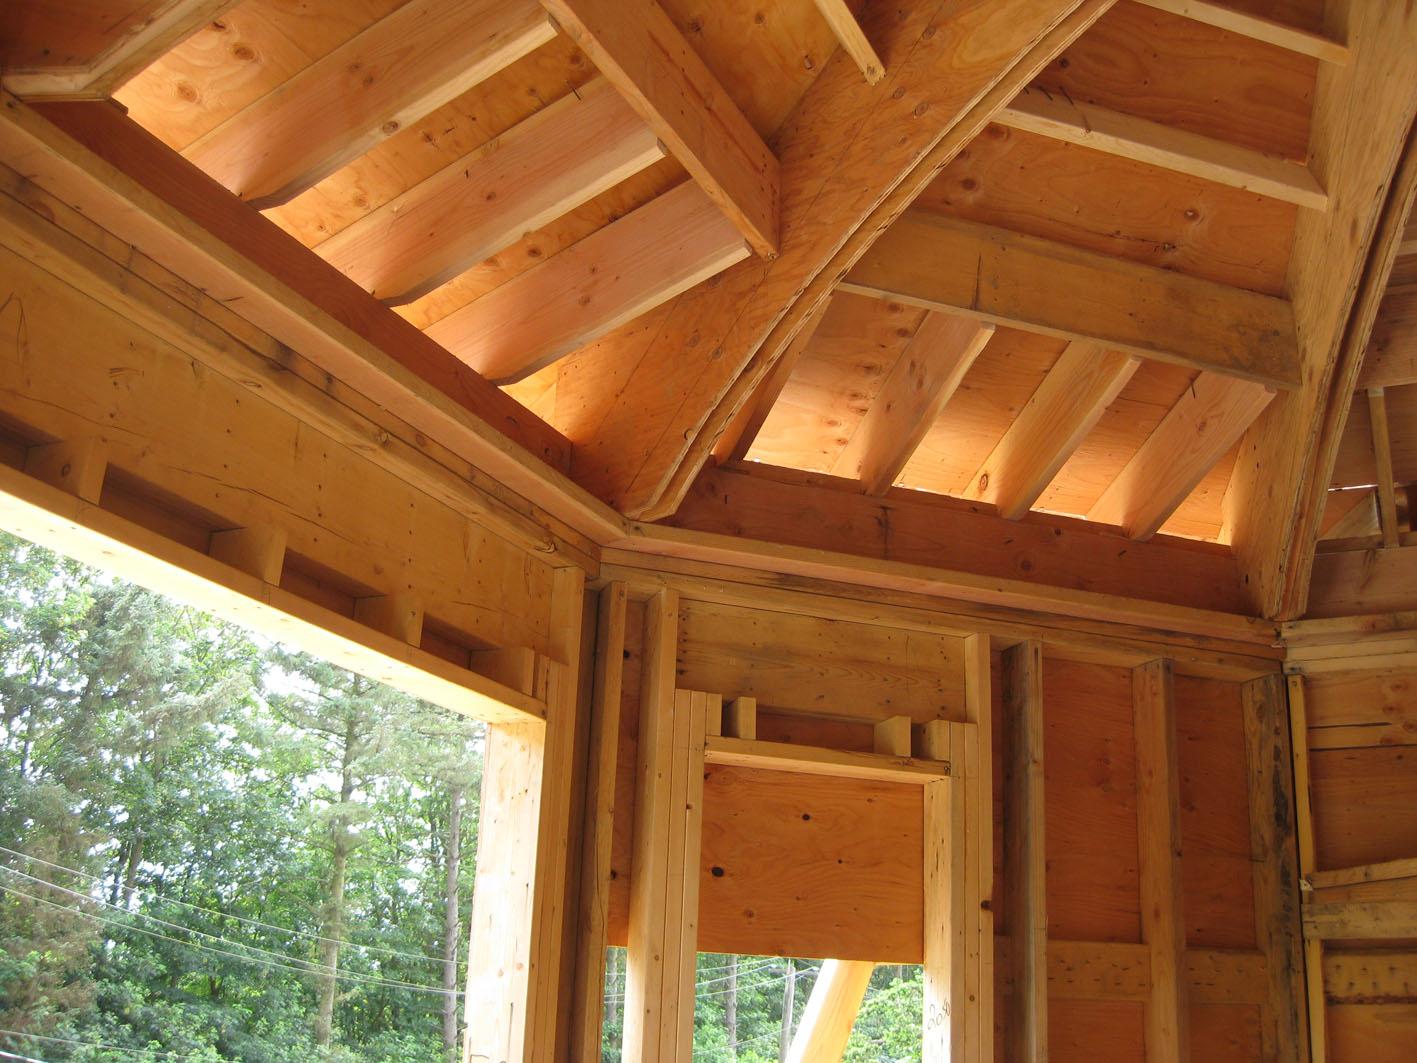 Turret Roof Framing